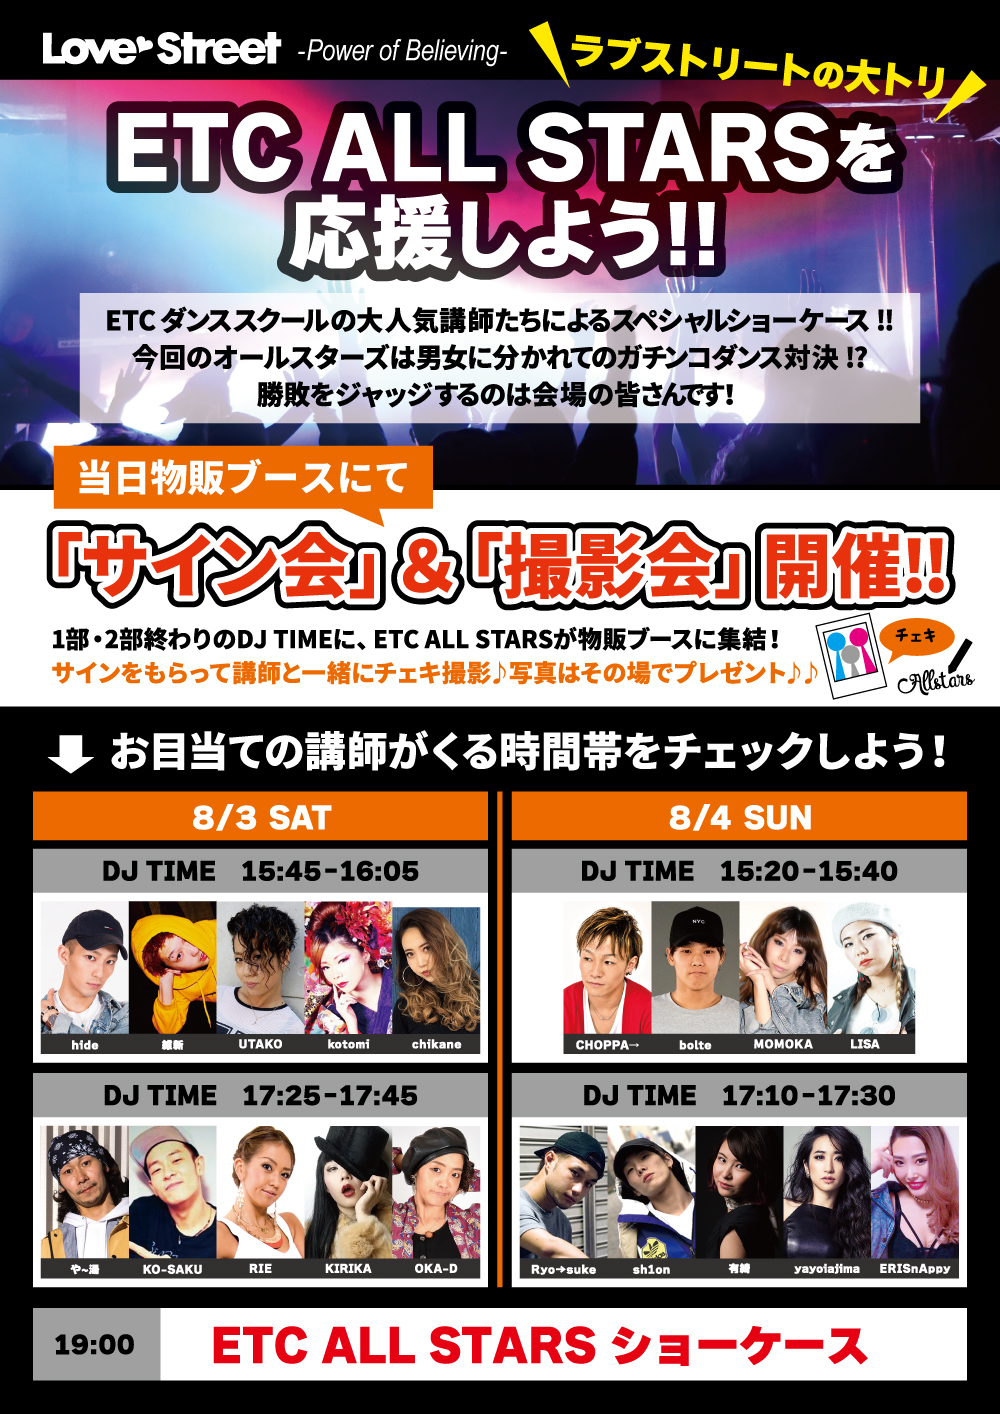 【LS東京】ETCオールスターズサイン撮影会POP